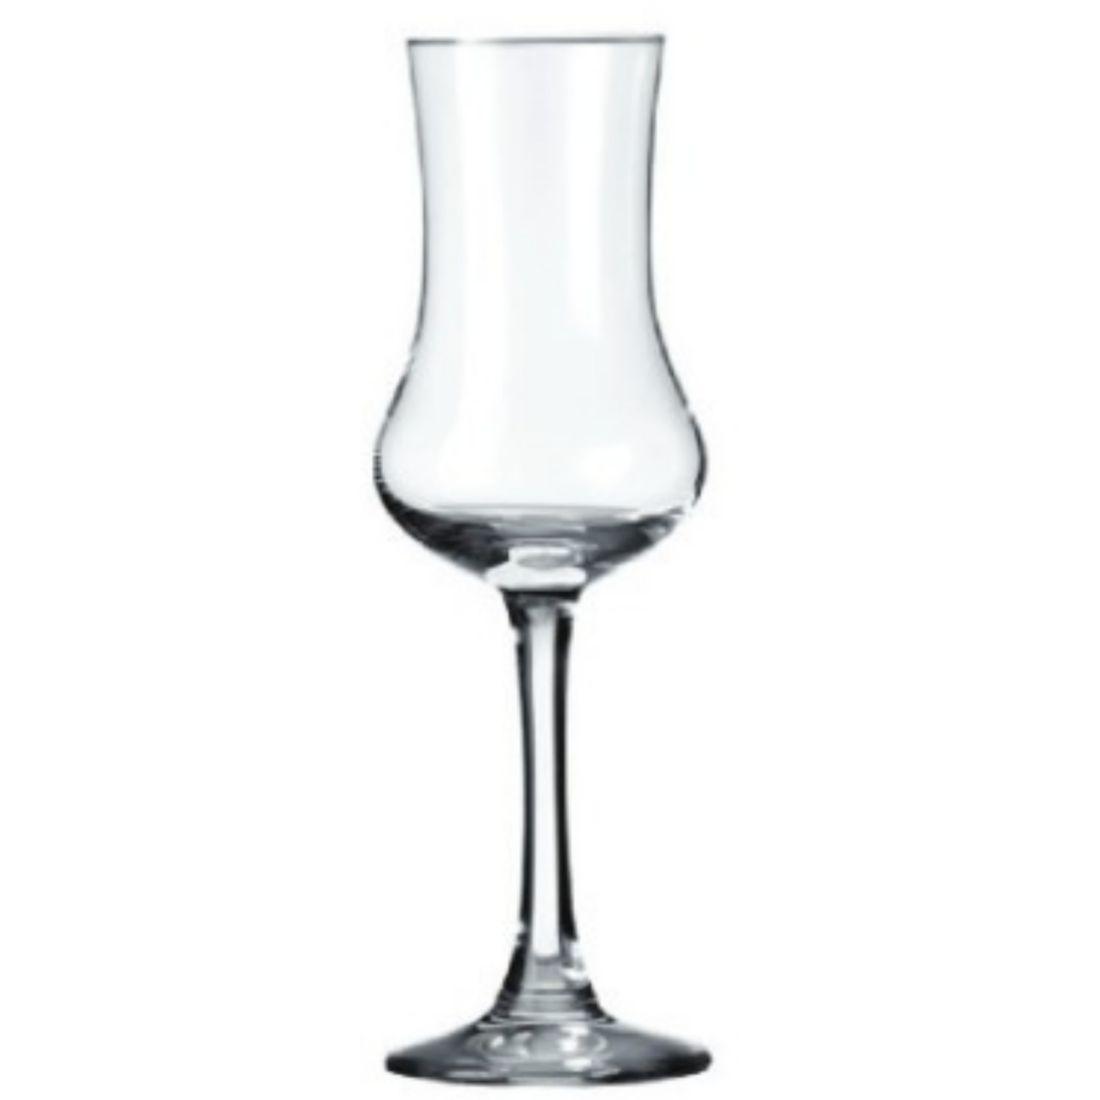 Grappa sklenička 9 cl